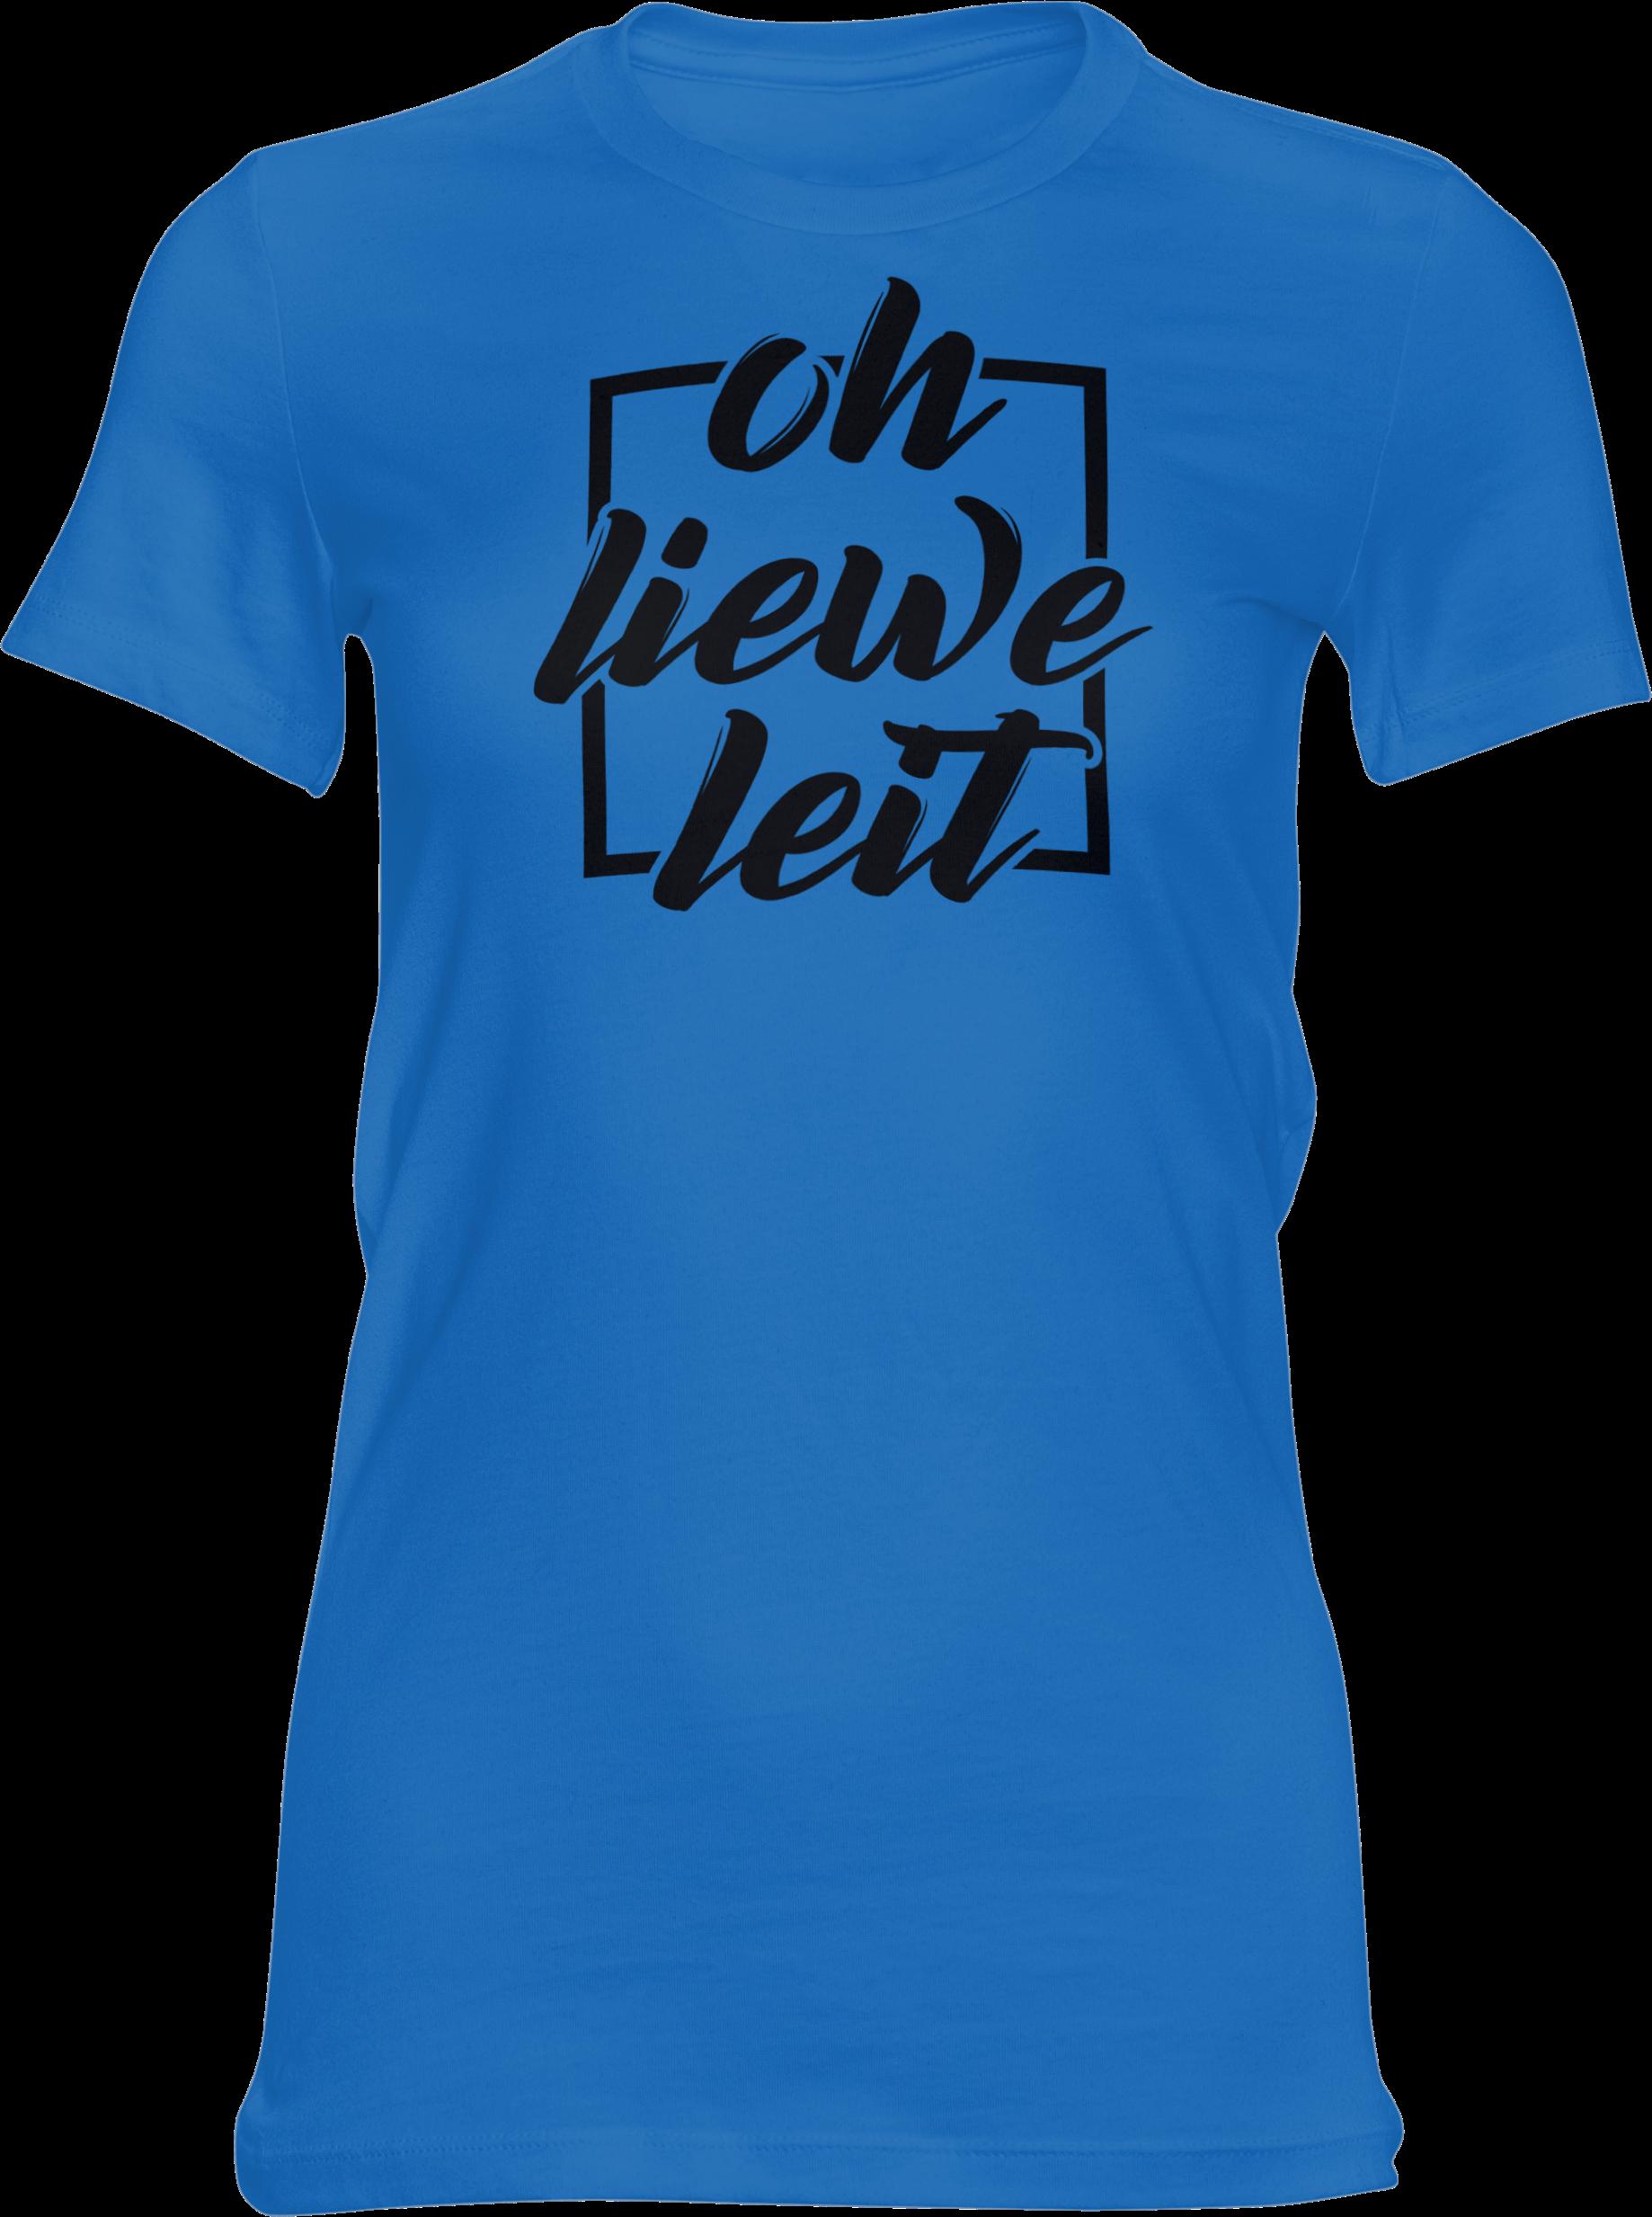 Motiv-Shirt – Oh liewe Leit – Girlie-Shirt (blau)